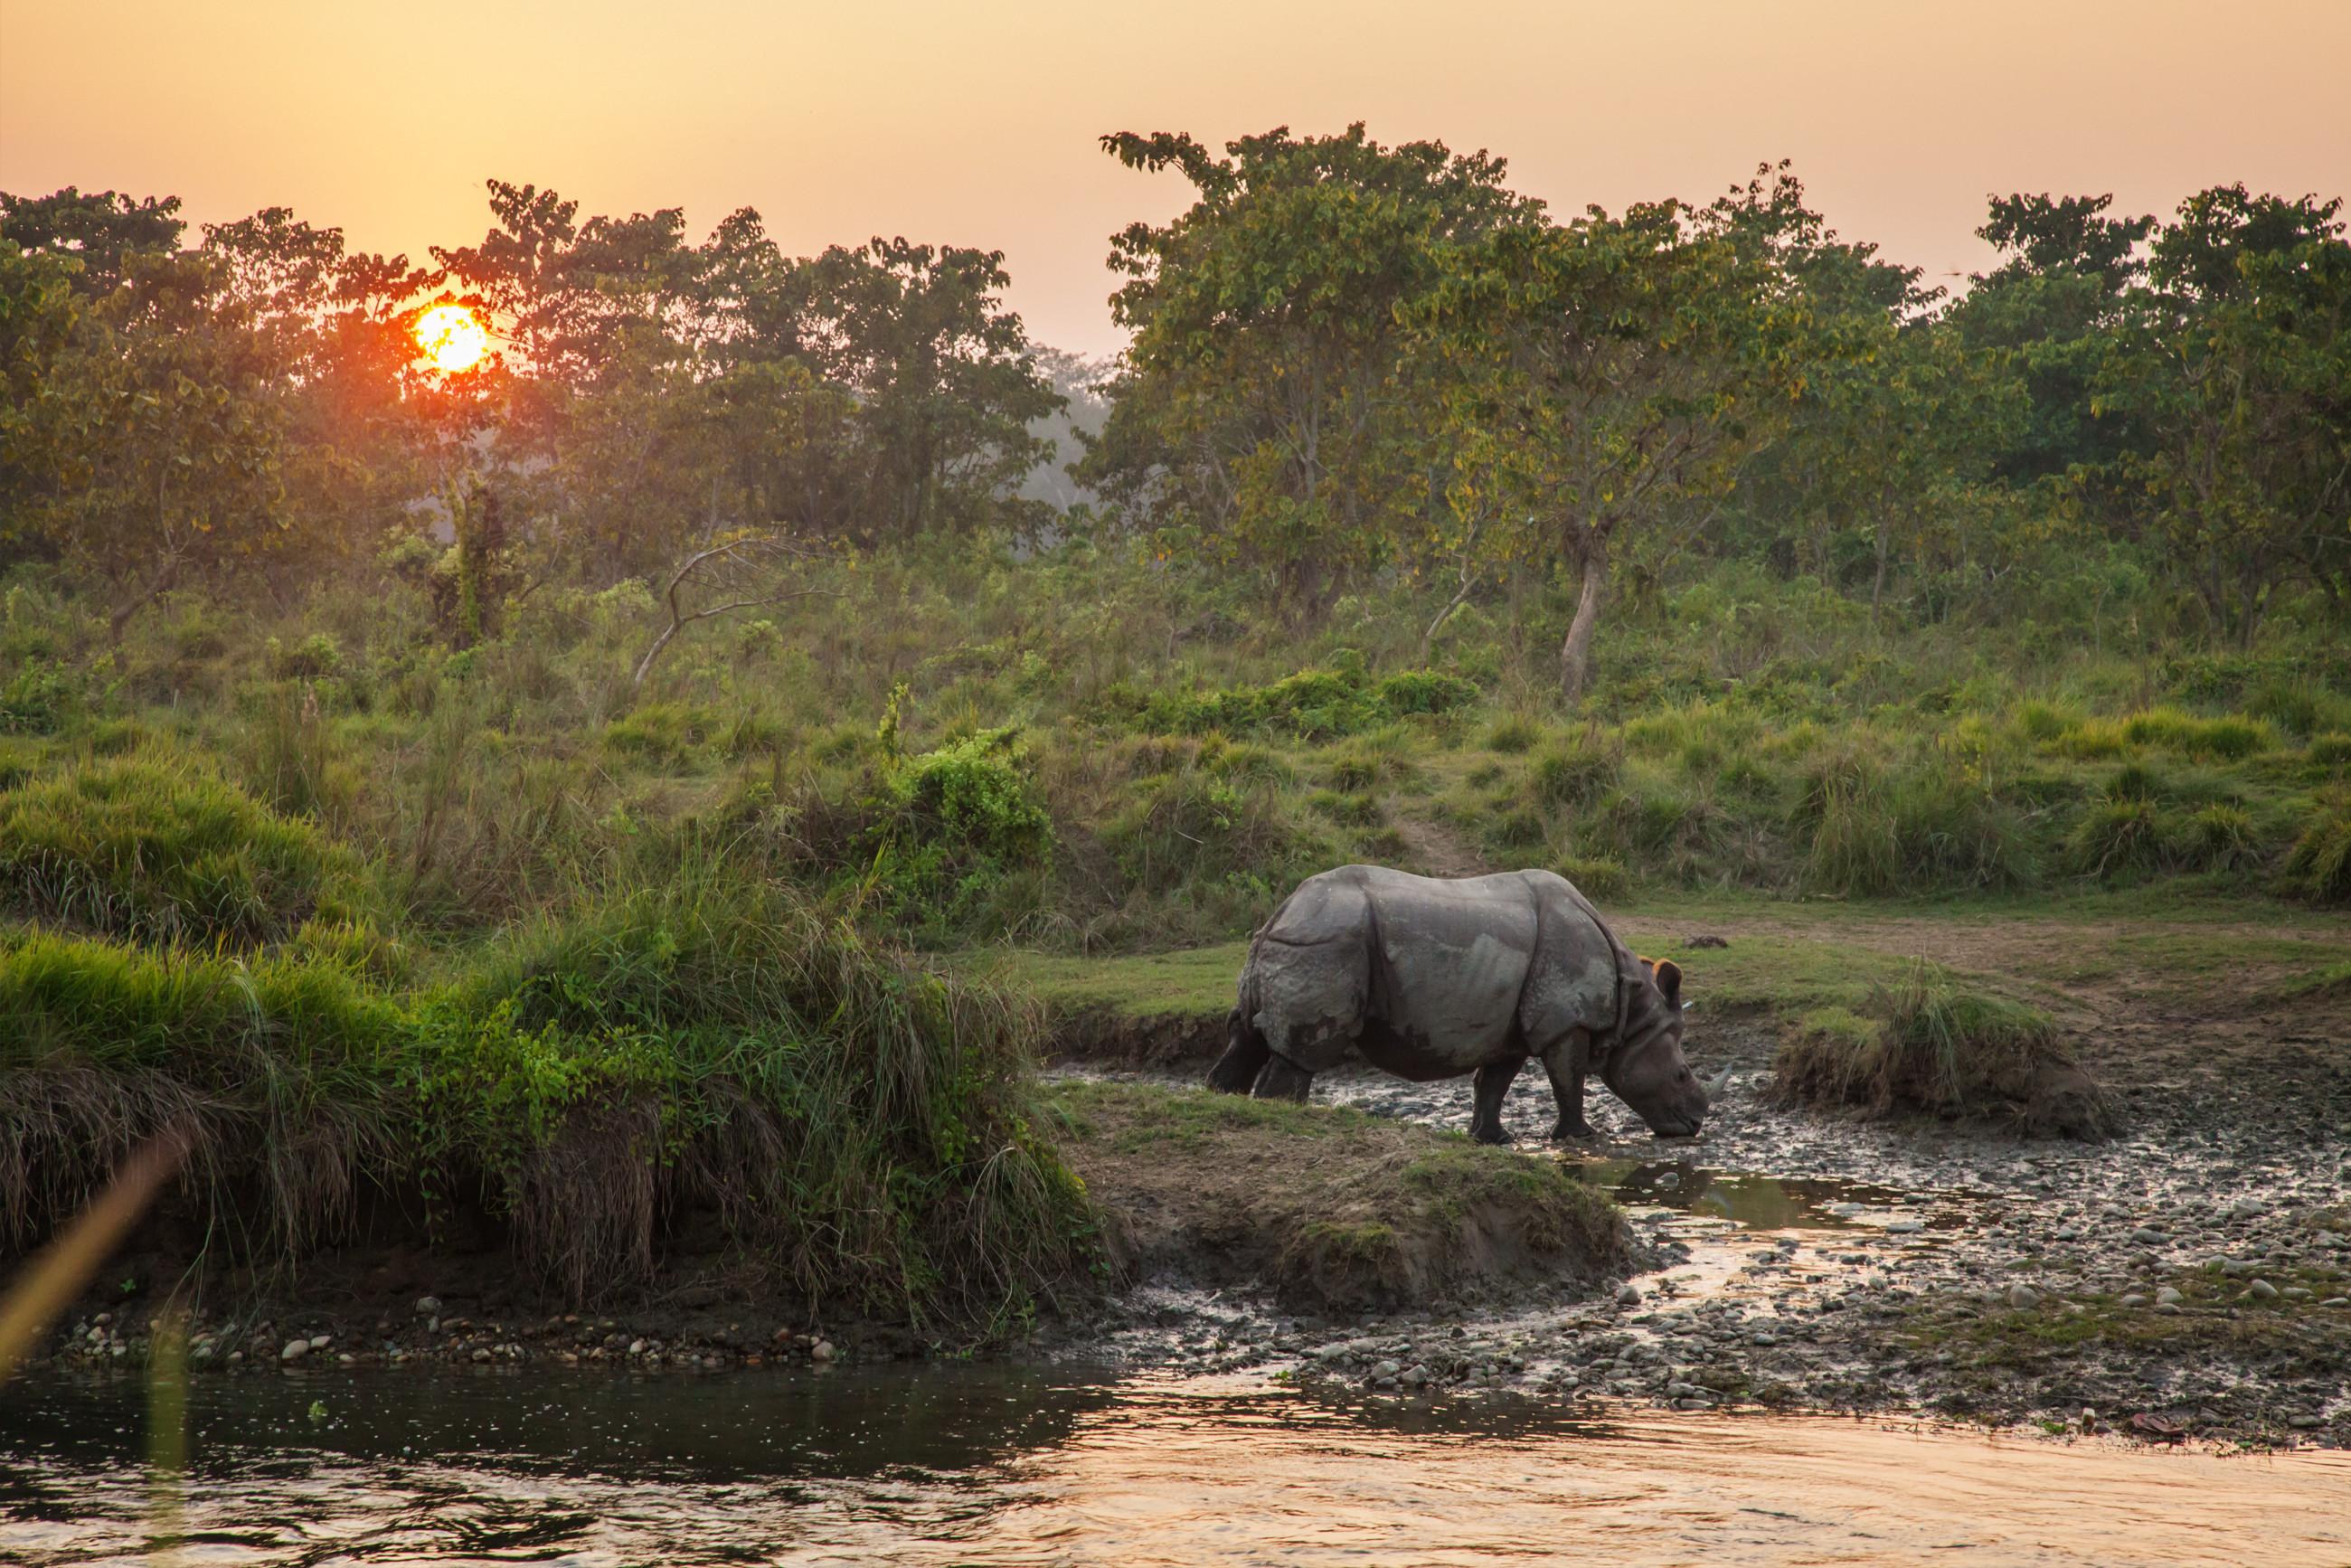 https://bubo.sk/uploads/covery_2019/chitwan_cover.jpg